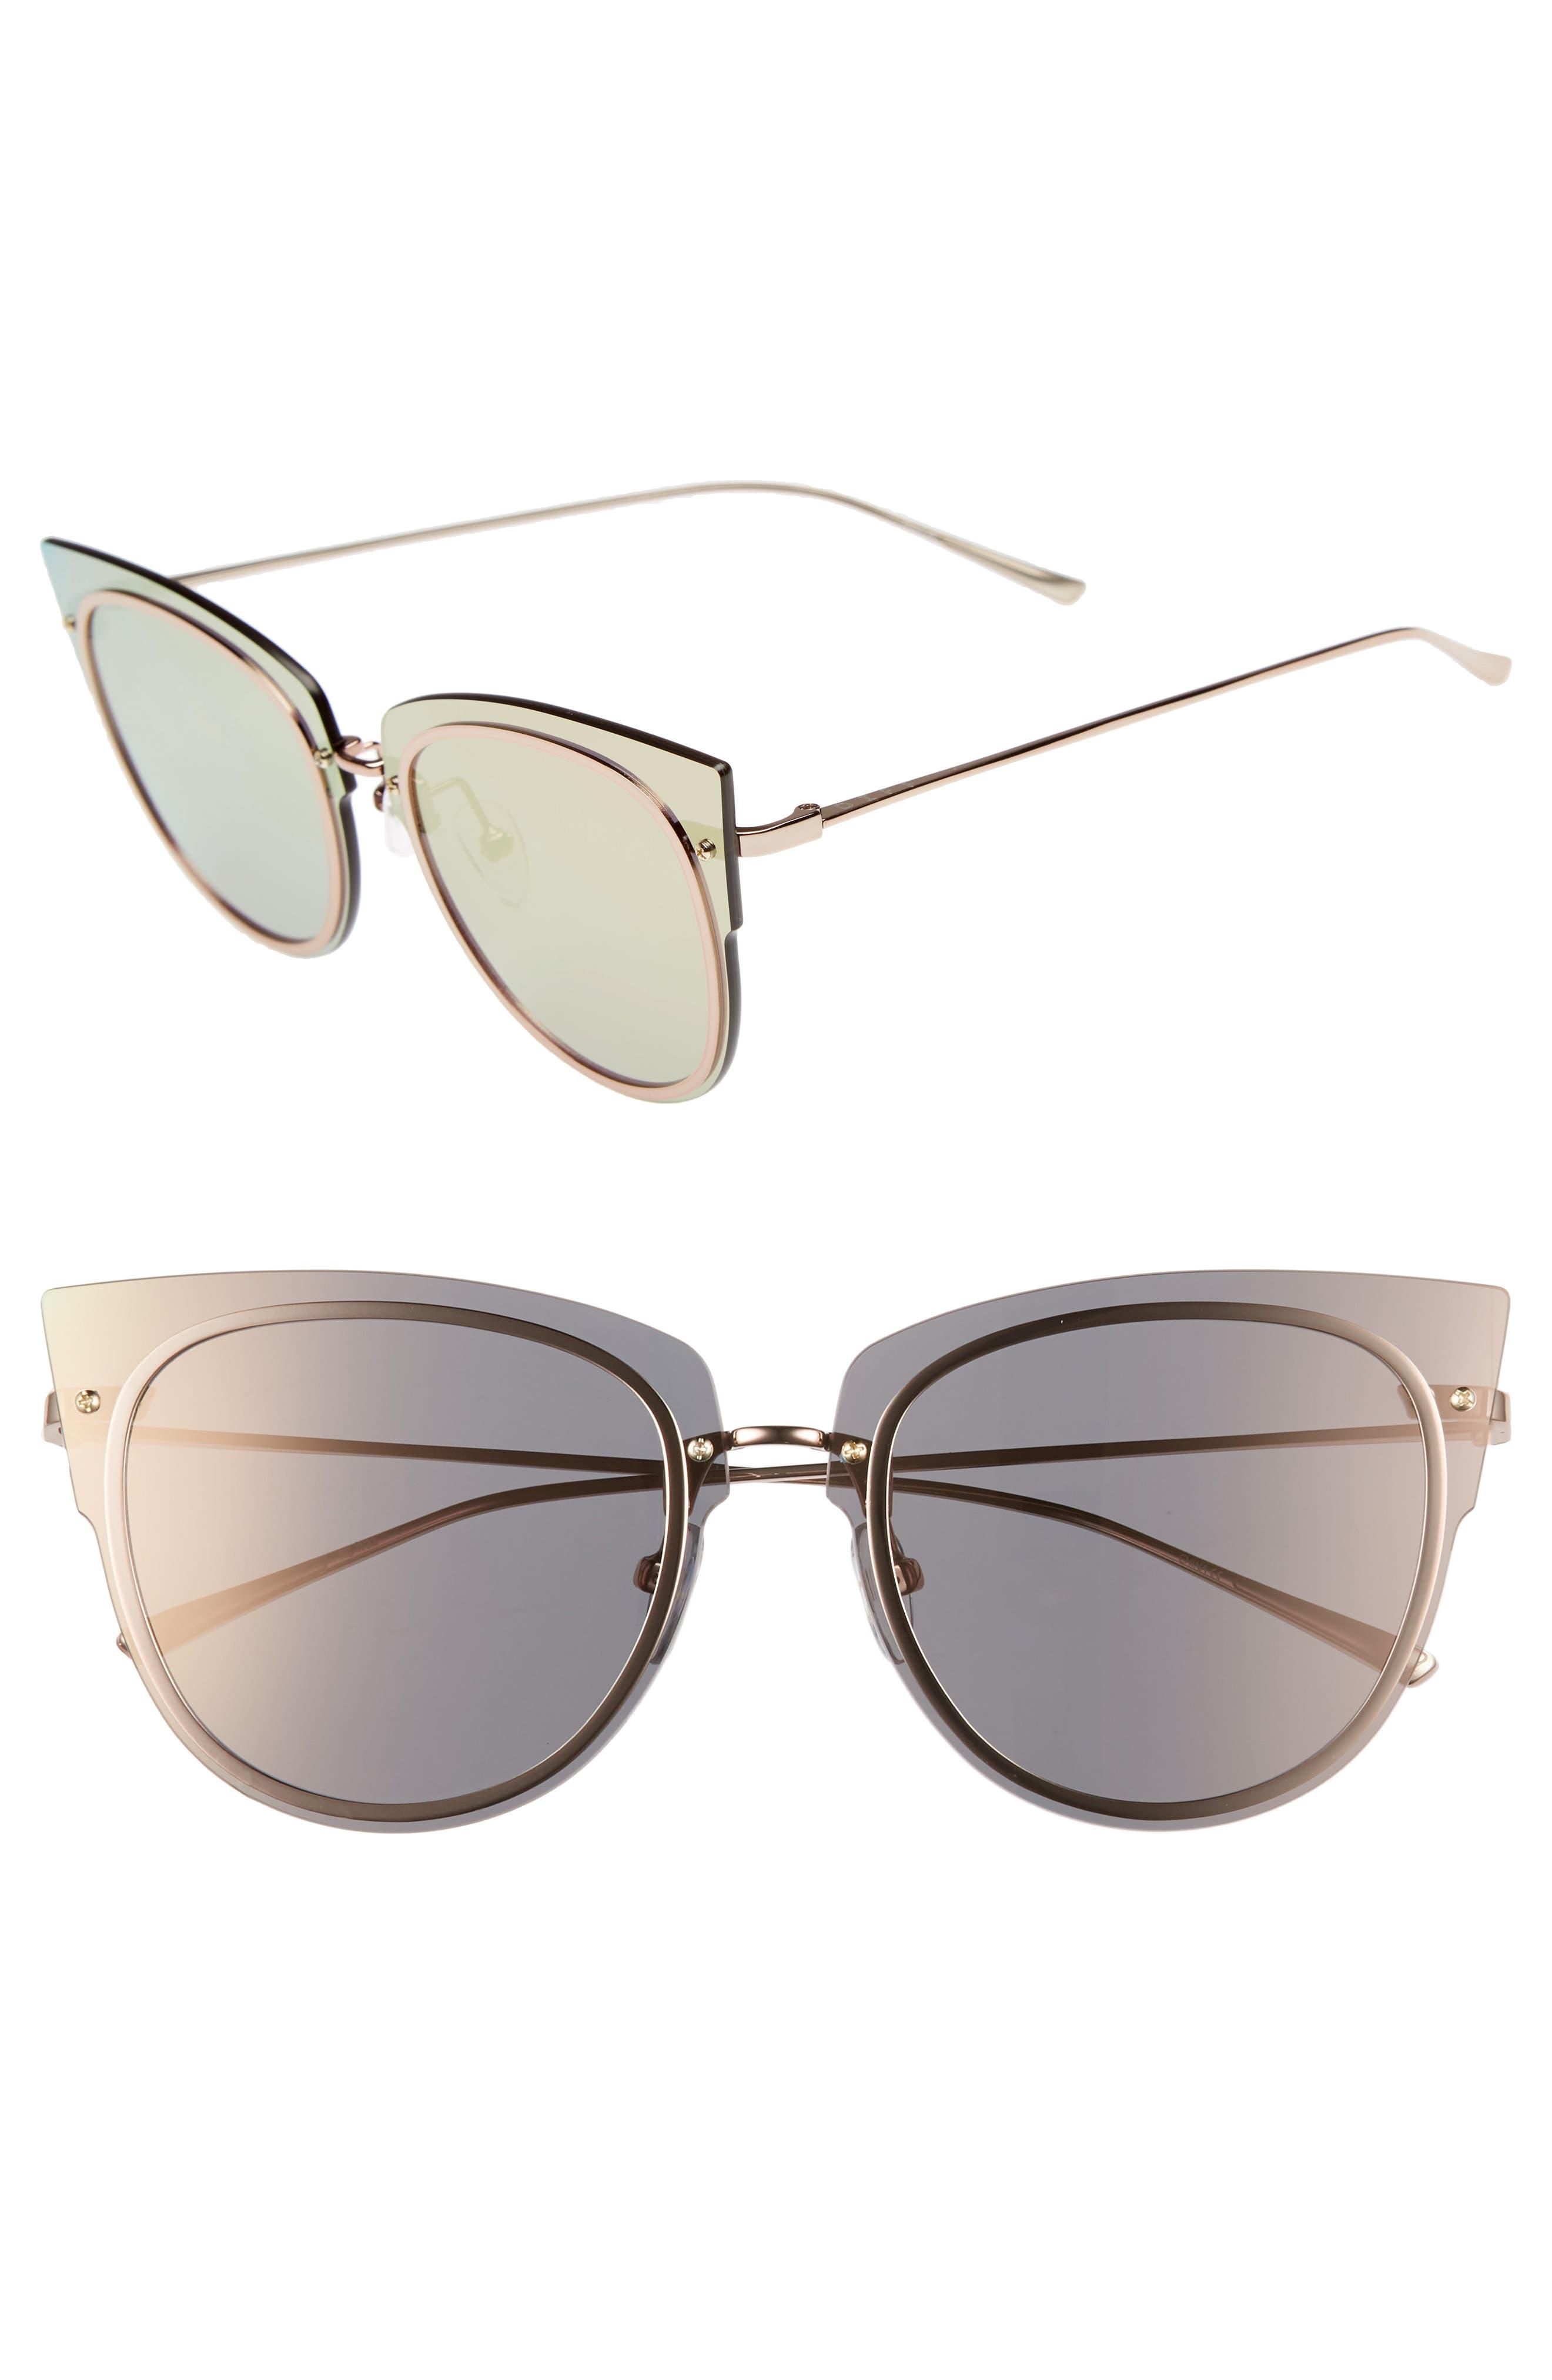 x Demi Lovato DEMI 50mm Rimless Cat Eye Sunglasses,                             Main thumbnail 1, color,                             GUNMETAL/ GREY